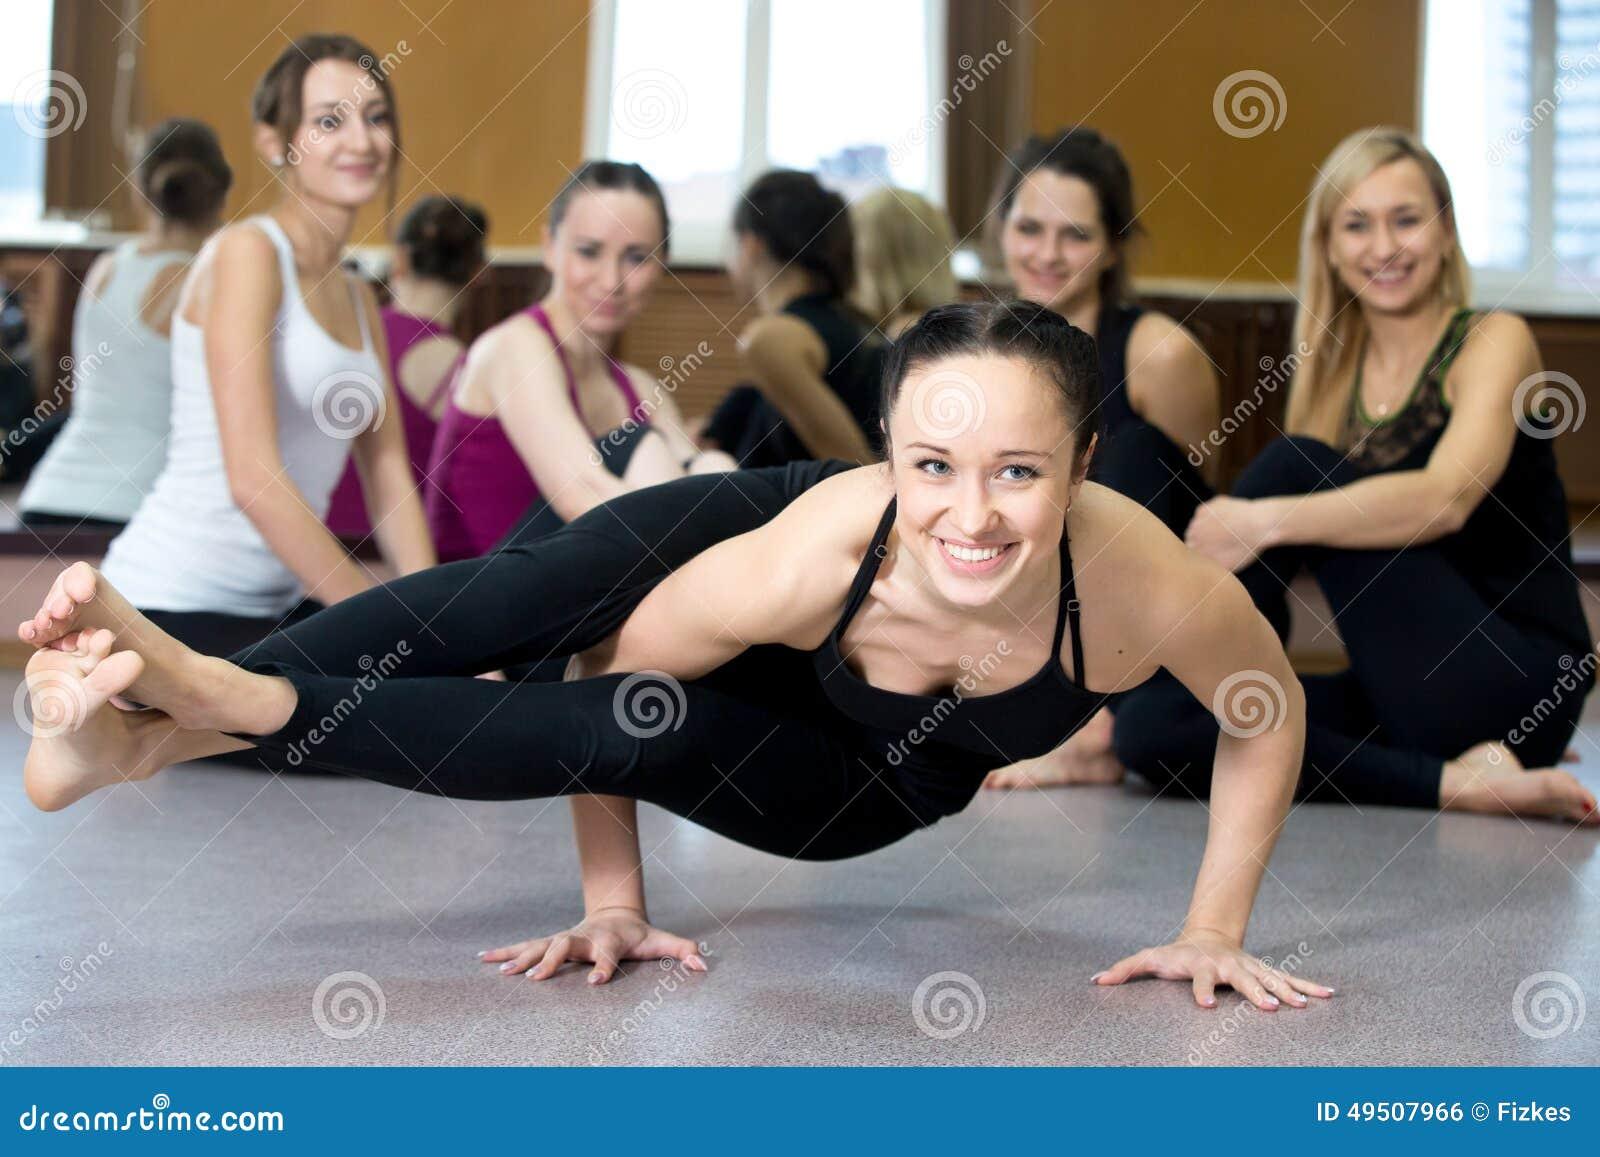 Yogi girl exercising, doing ashtavakrasana, handstand push-ups